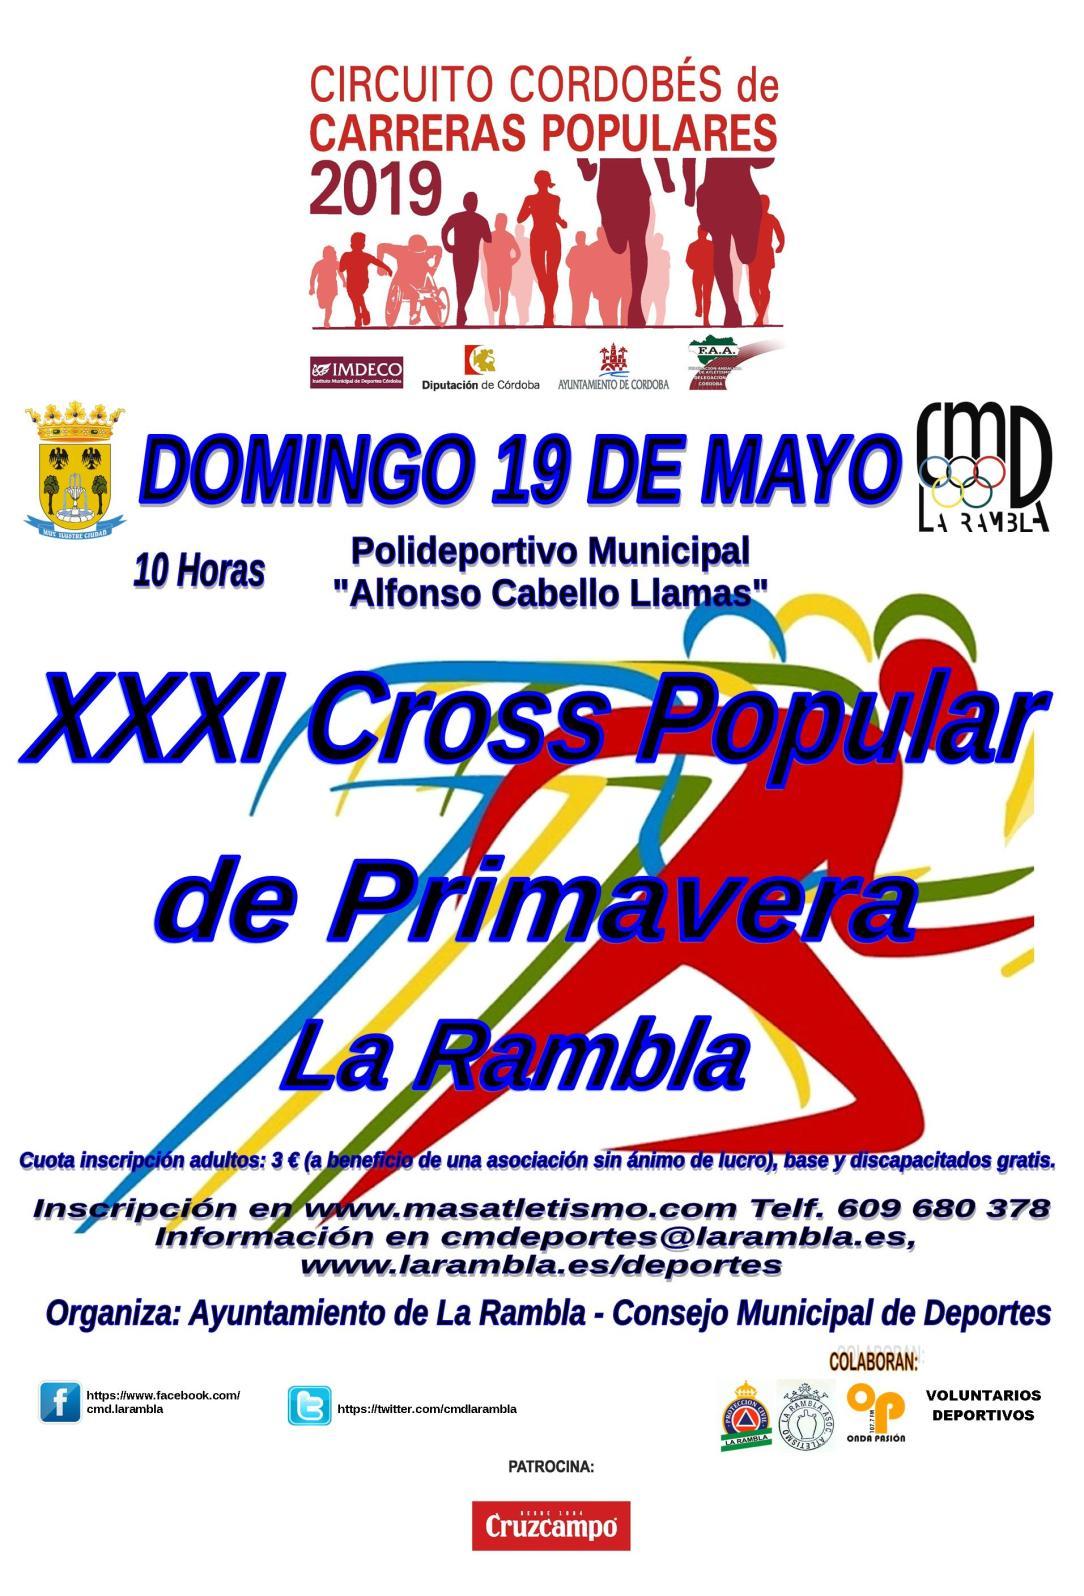 XXXI Cross de Primavera